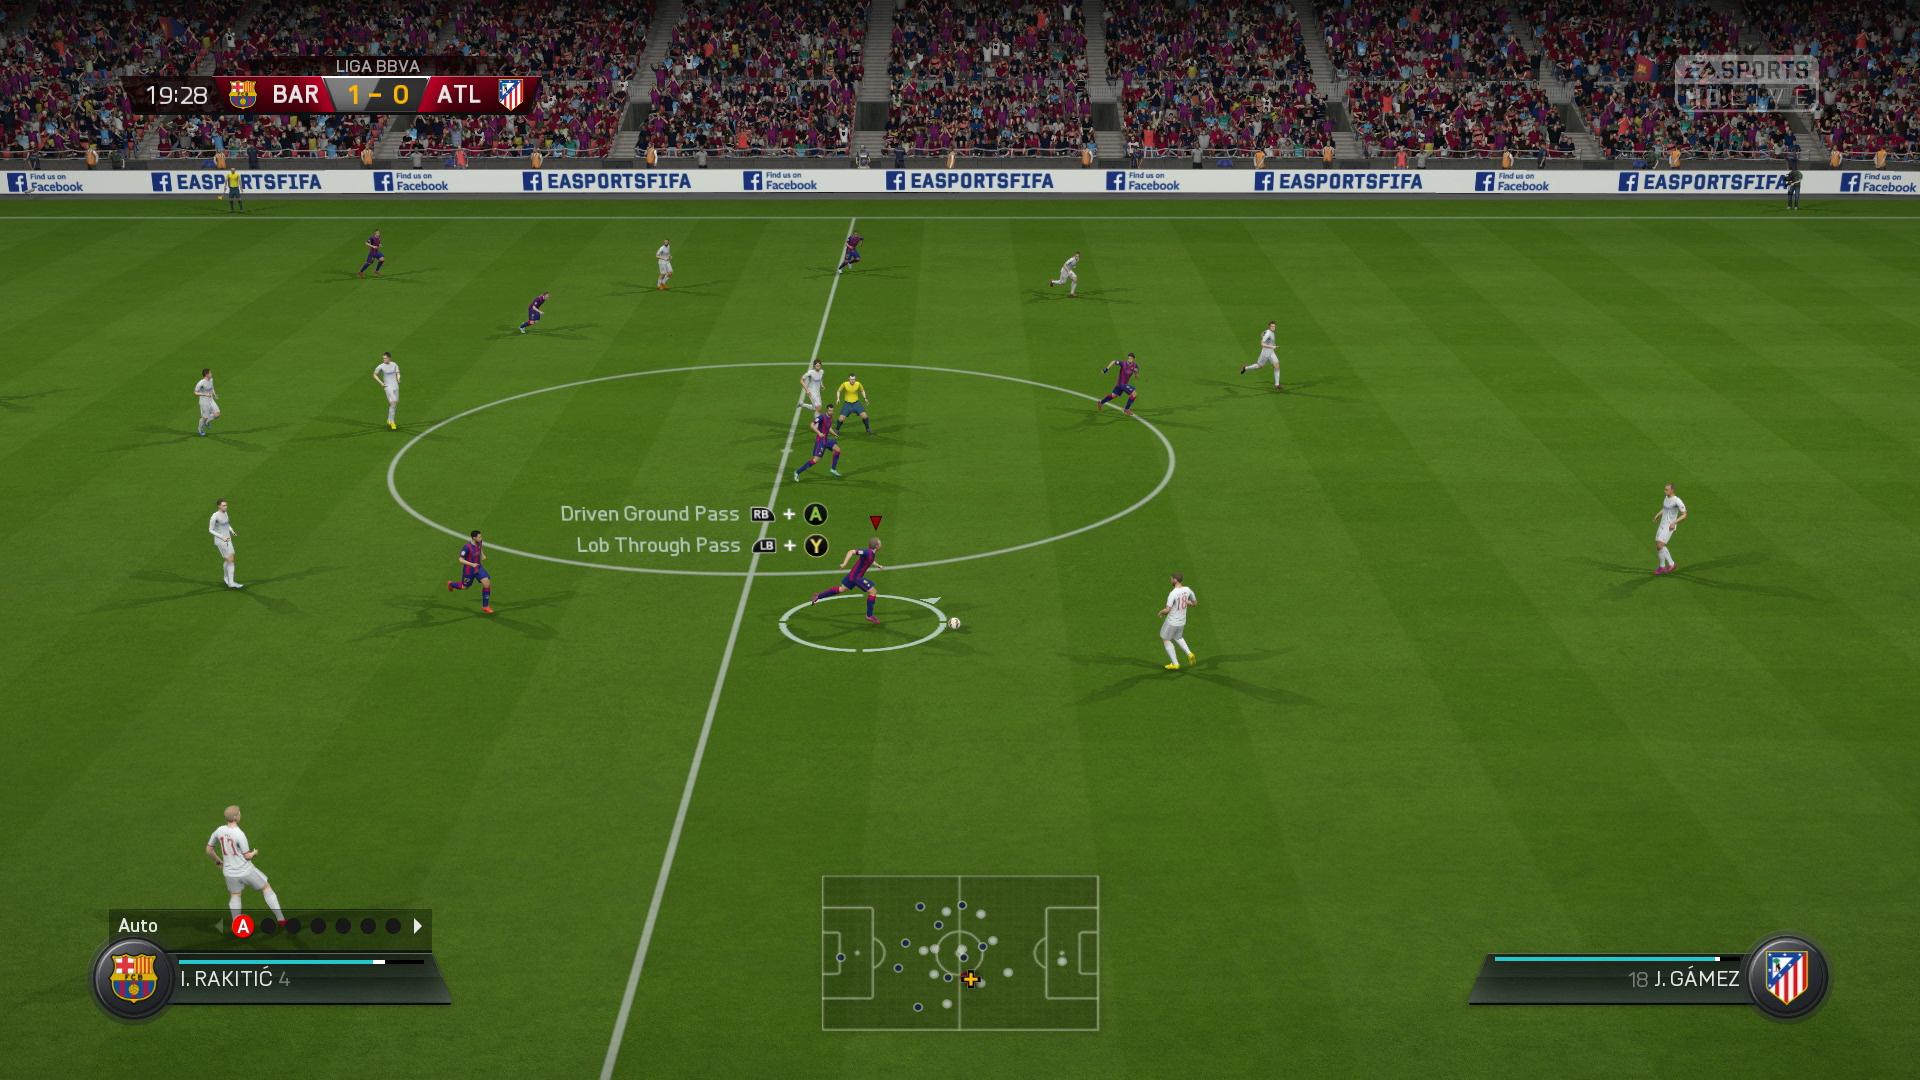 FIFA16 XboxOne PS4 LiveCapture FIFATrainer Pass screen xgamecenter